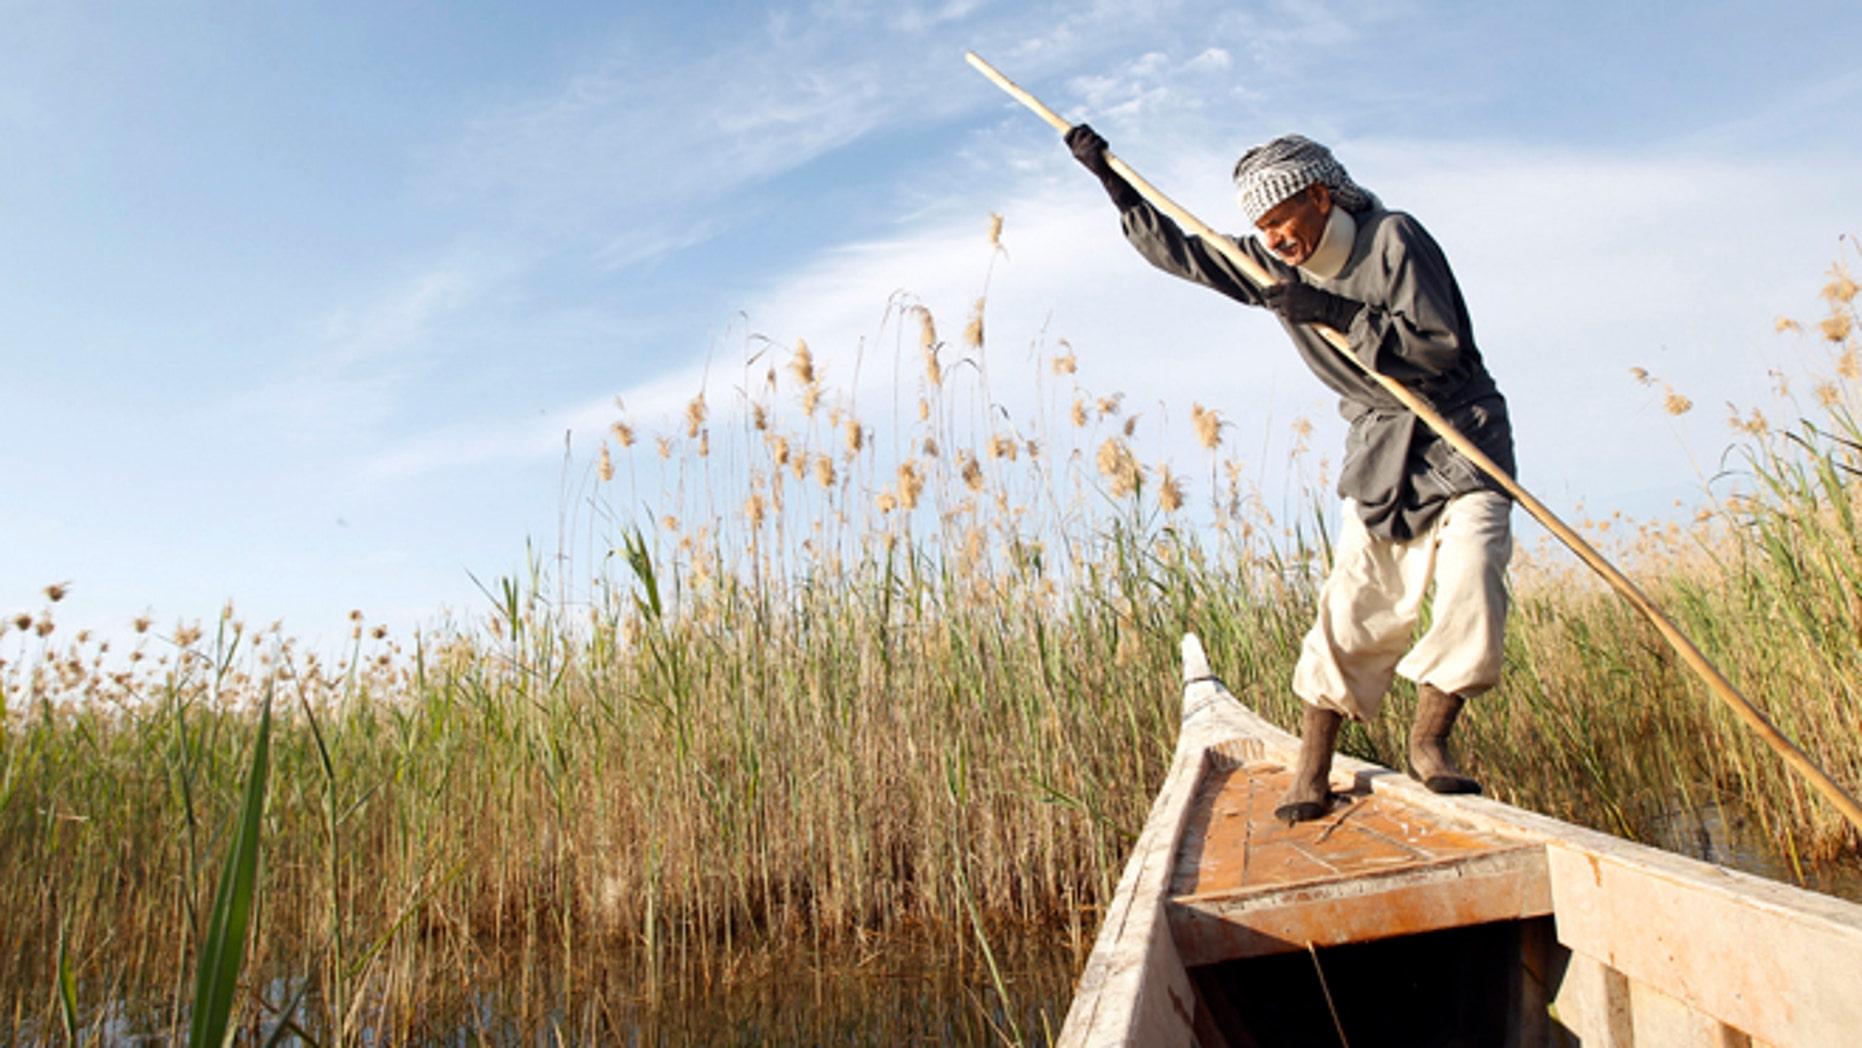 Marsh Arab Abu Sabah paddles his boat at the Chebayesh marsh in Nassiriya, 300 km (185 miles) southeast of Baghdad.